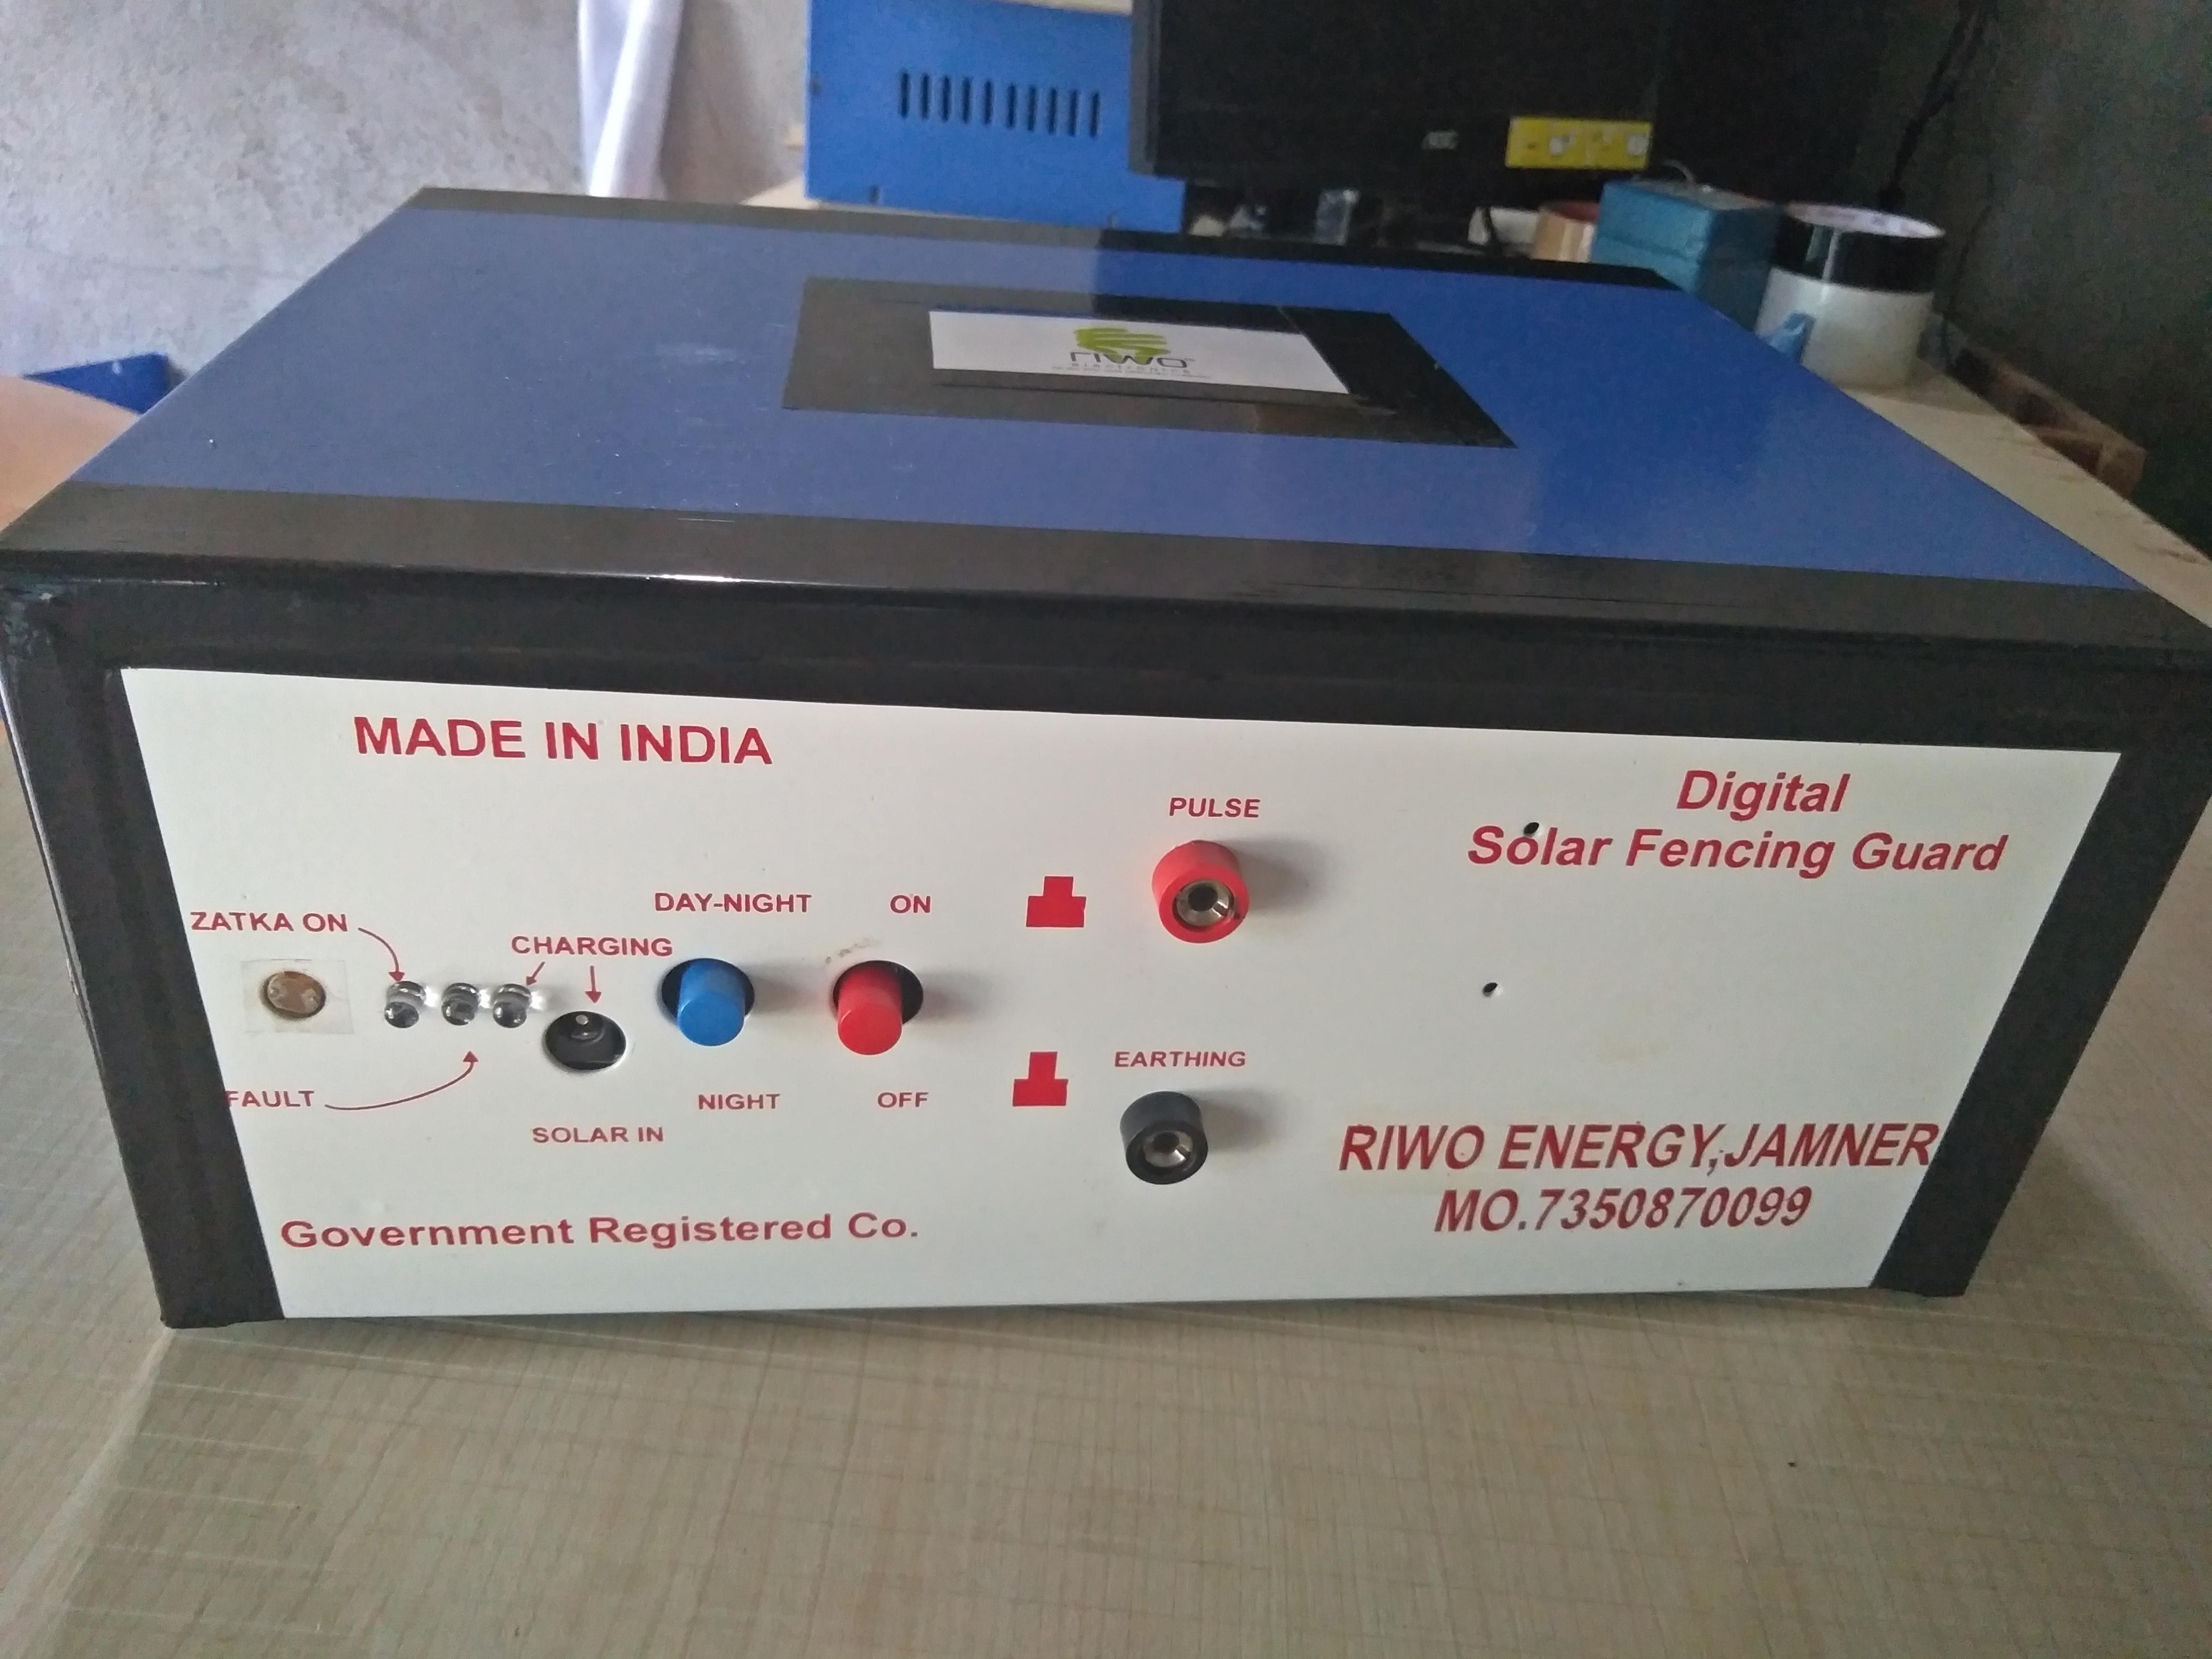 Digital Solar Fencing Guard